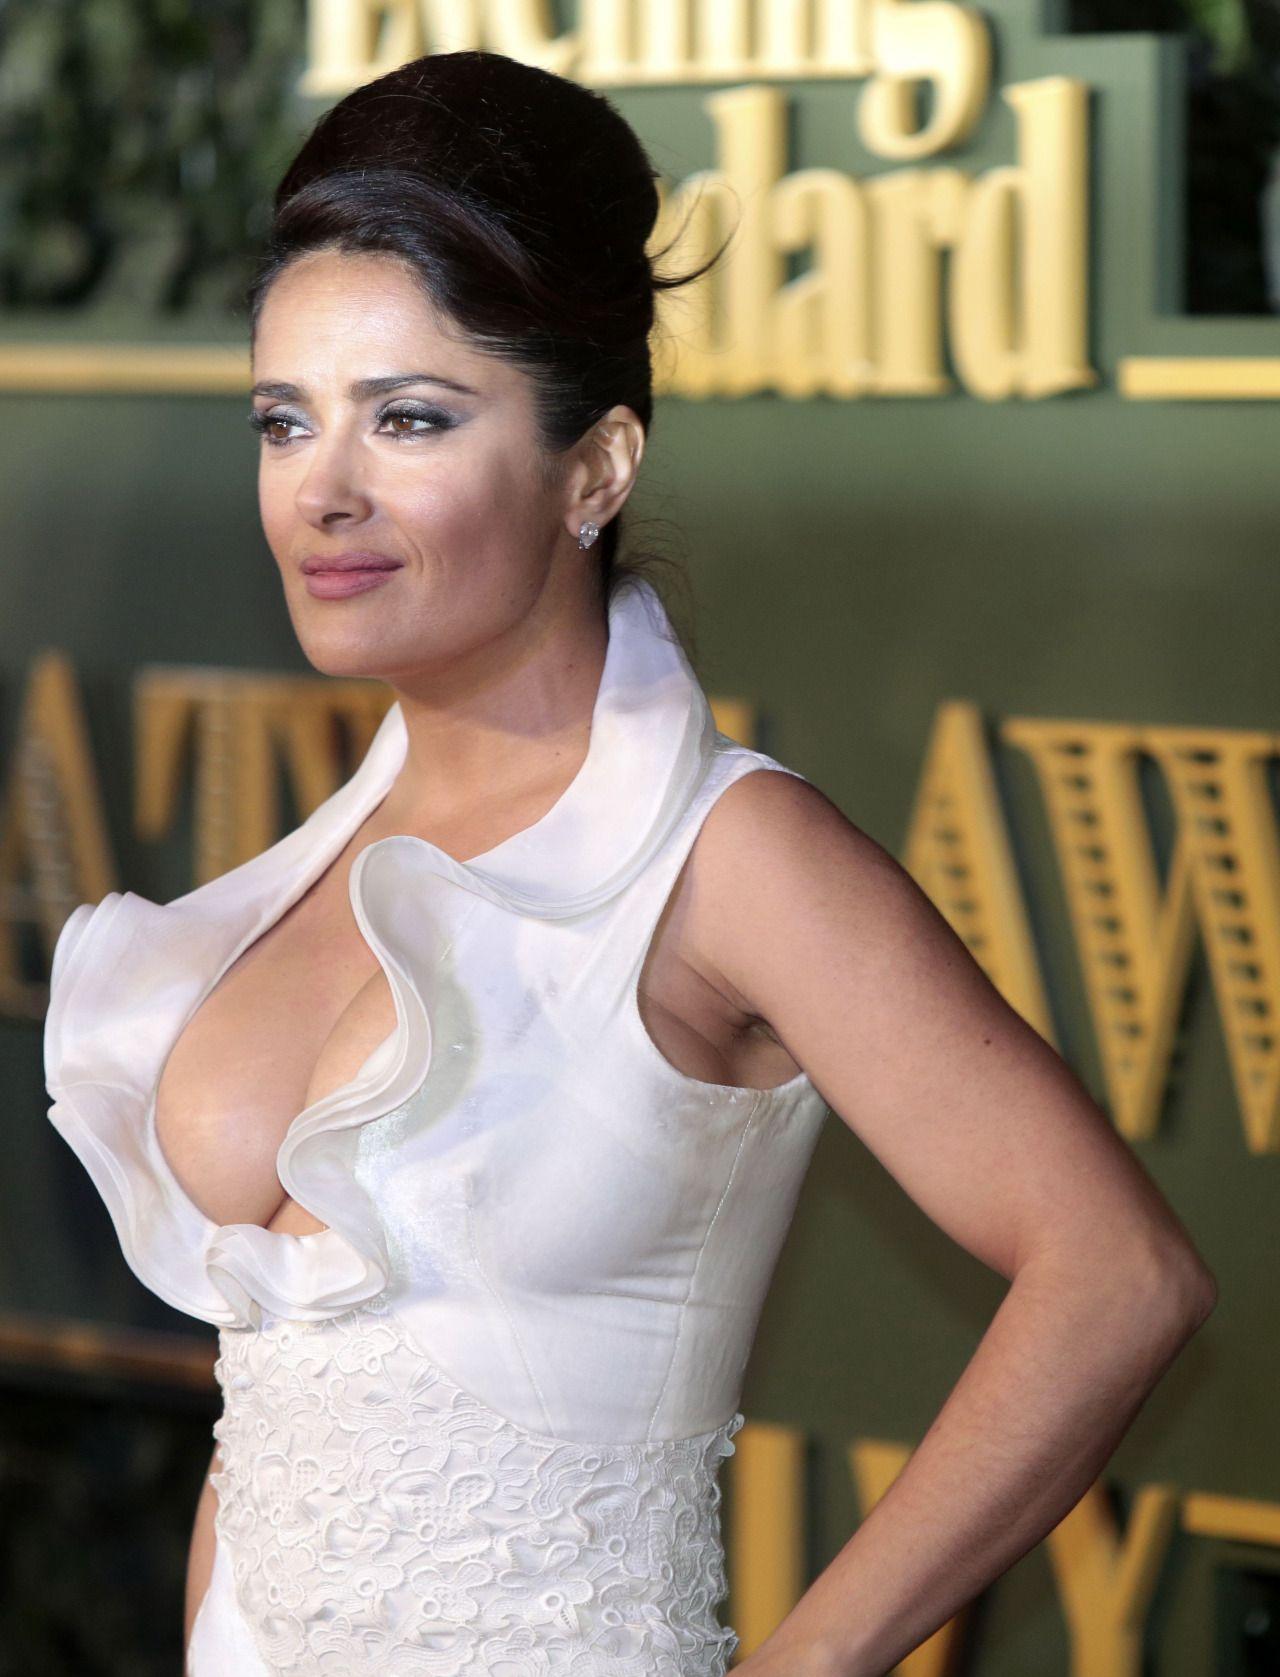 Salma Hayek's Breasts On Letterman The Nip Slip